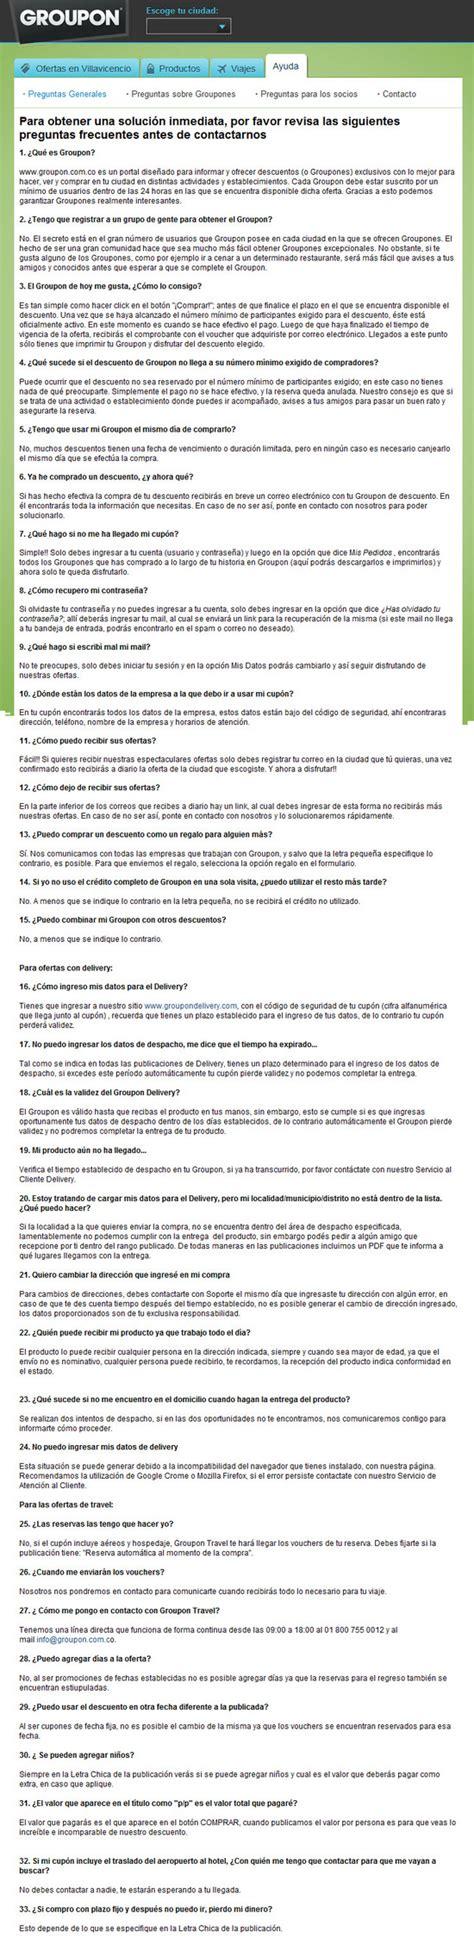 groupon colombia telefono groupon colombia ayuda - Preguntas Frecuentes Groupon